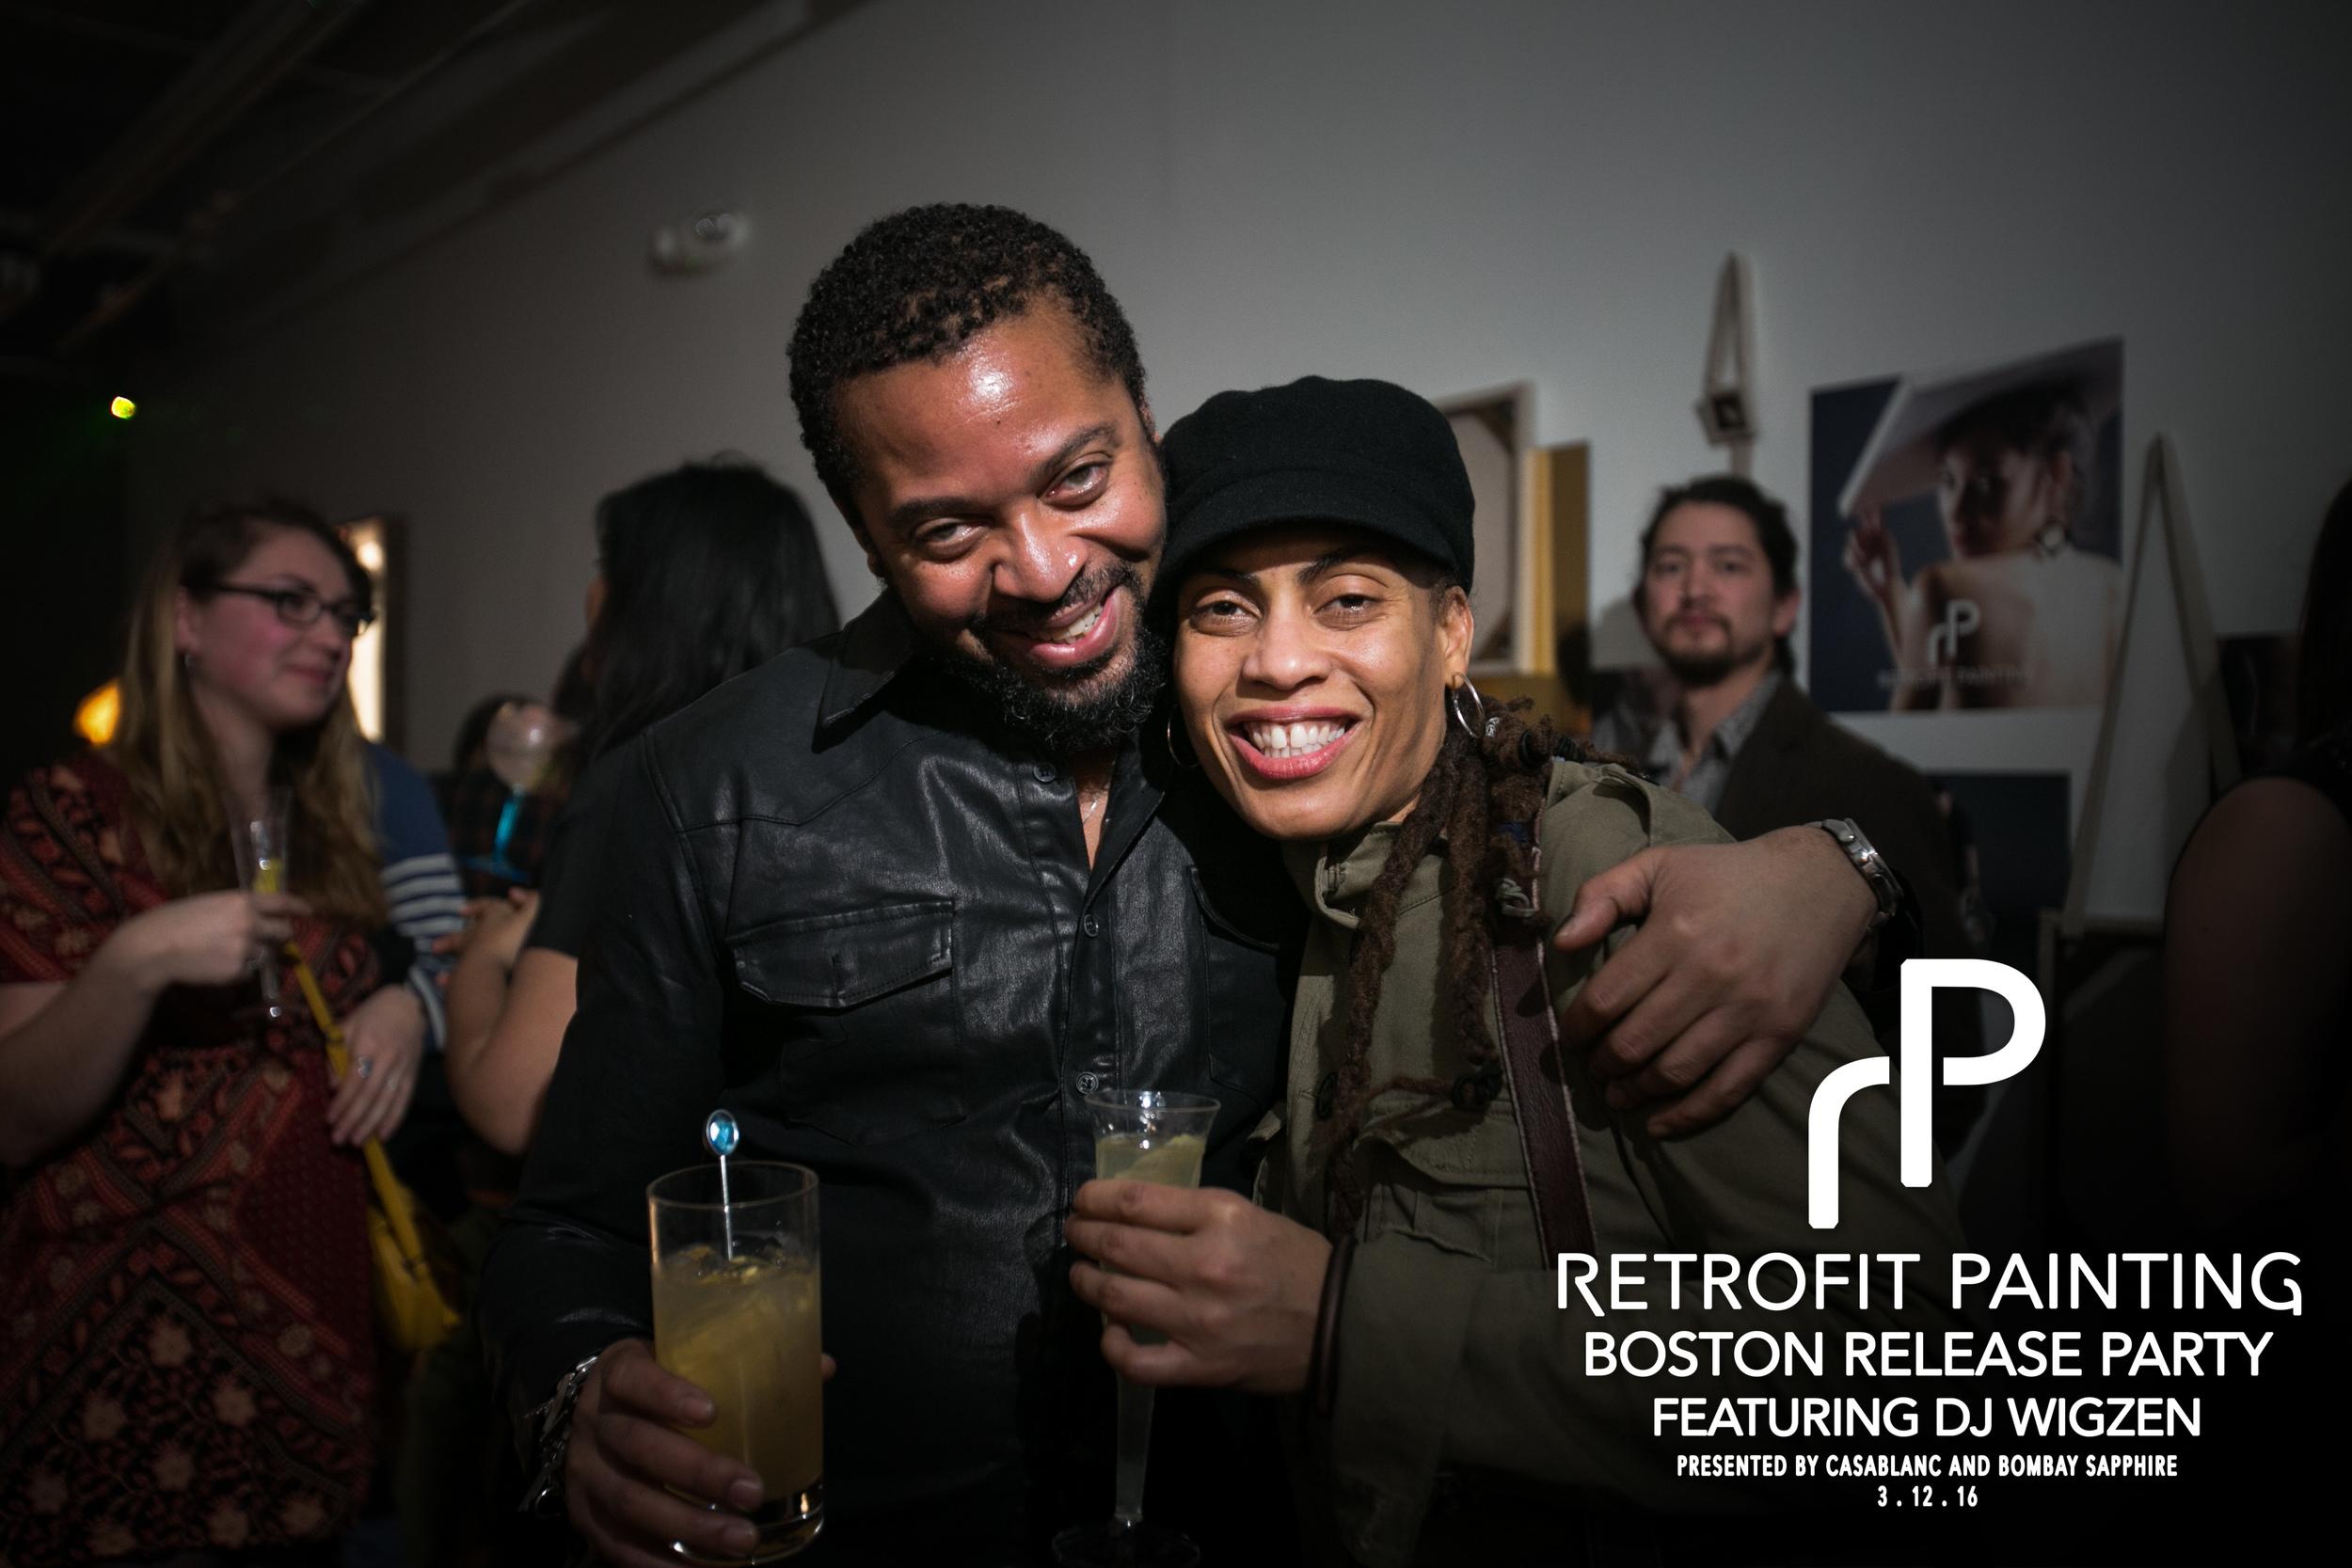 Retrofit Painting Boston Release Party 0208.jpg